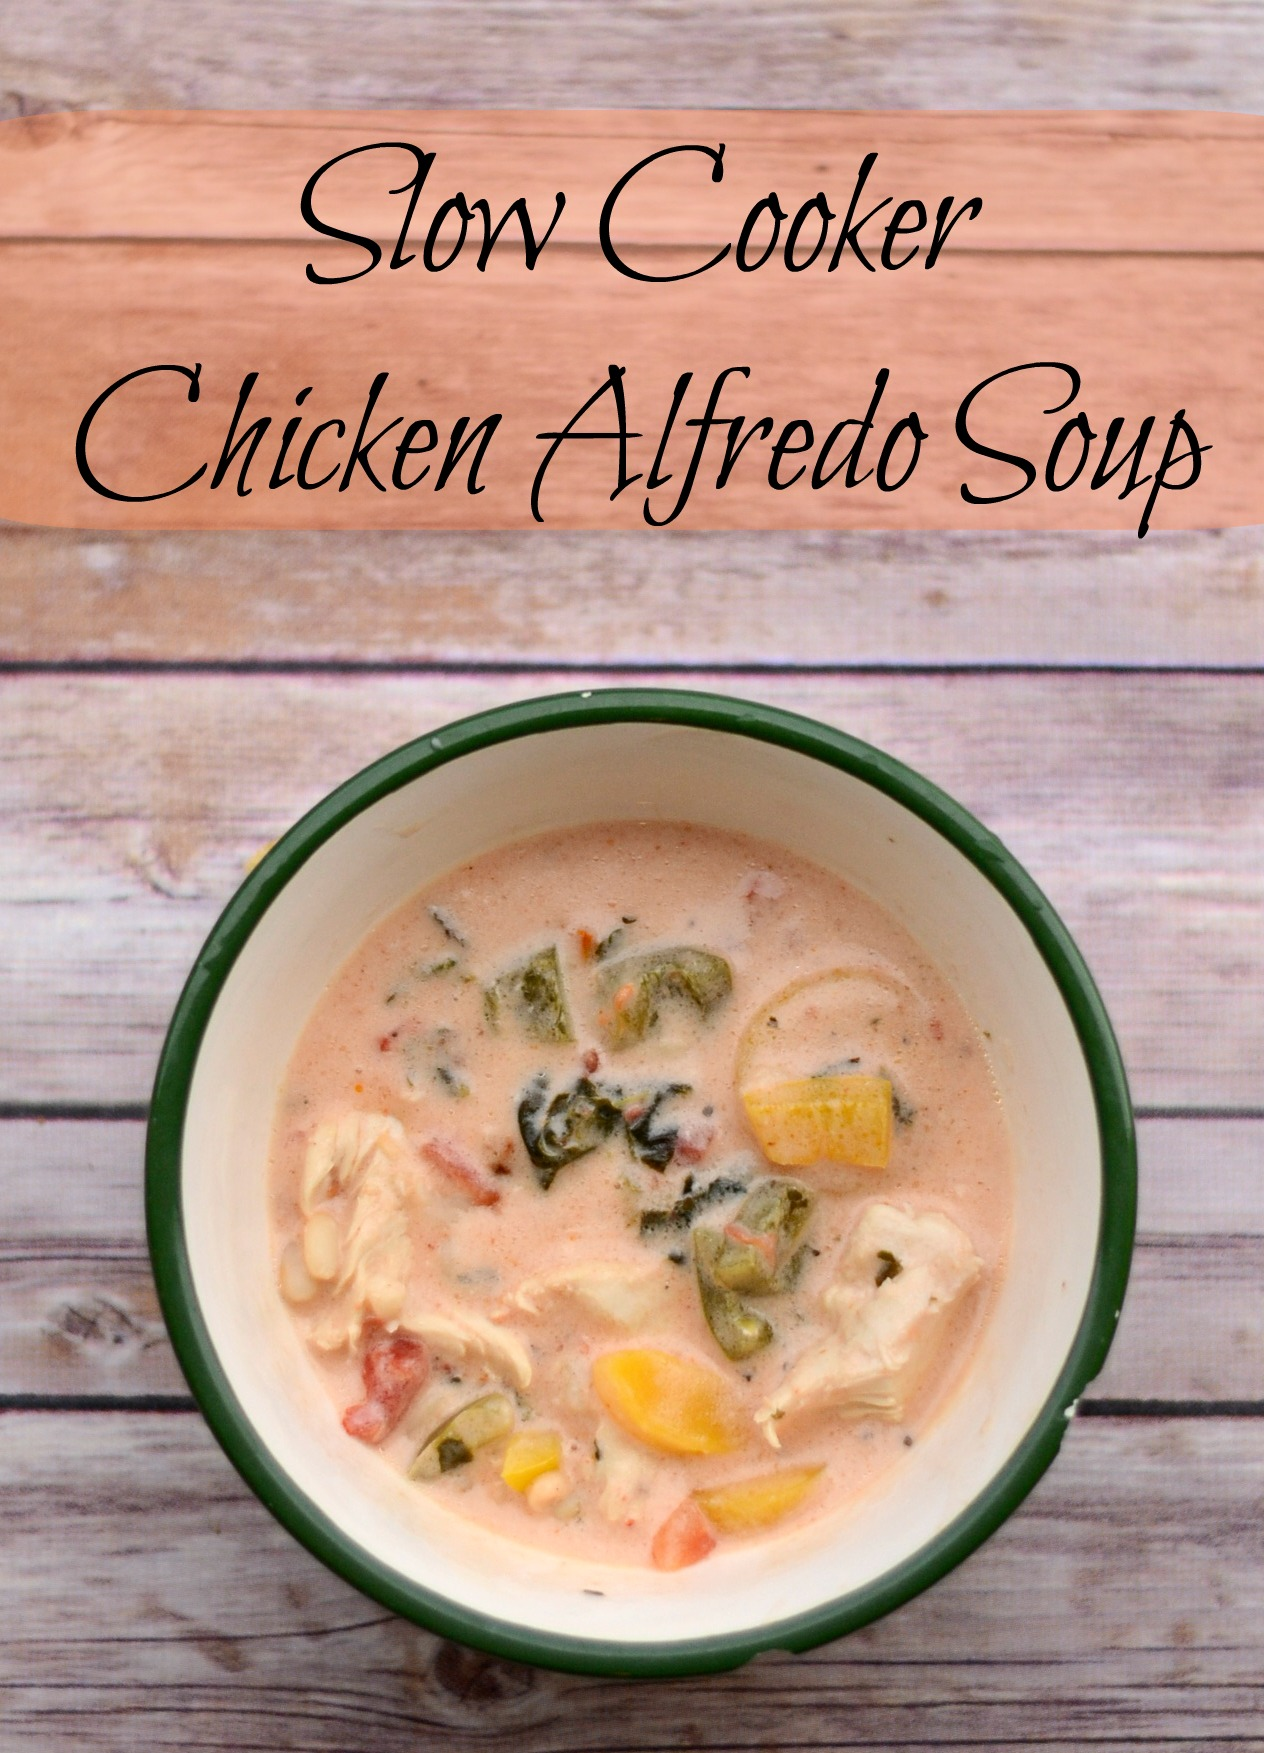 Slow Cooker Chicken Alfredo Soup with #STARoliveoil #shop #cbias